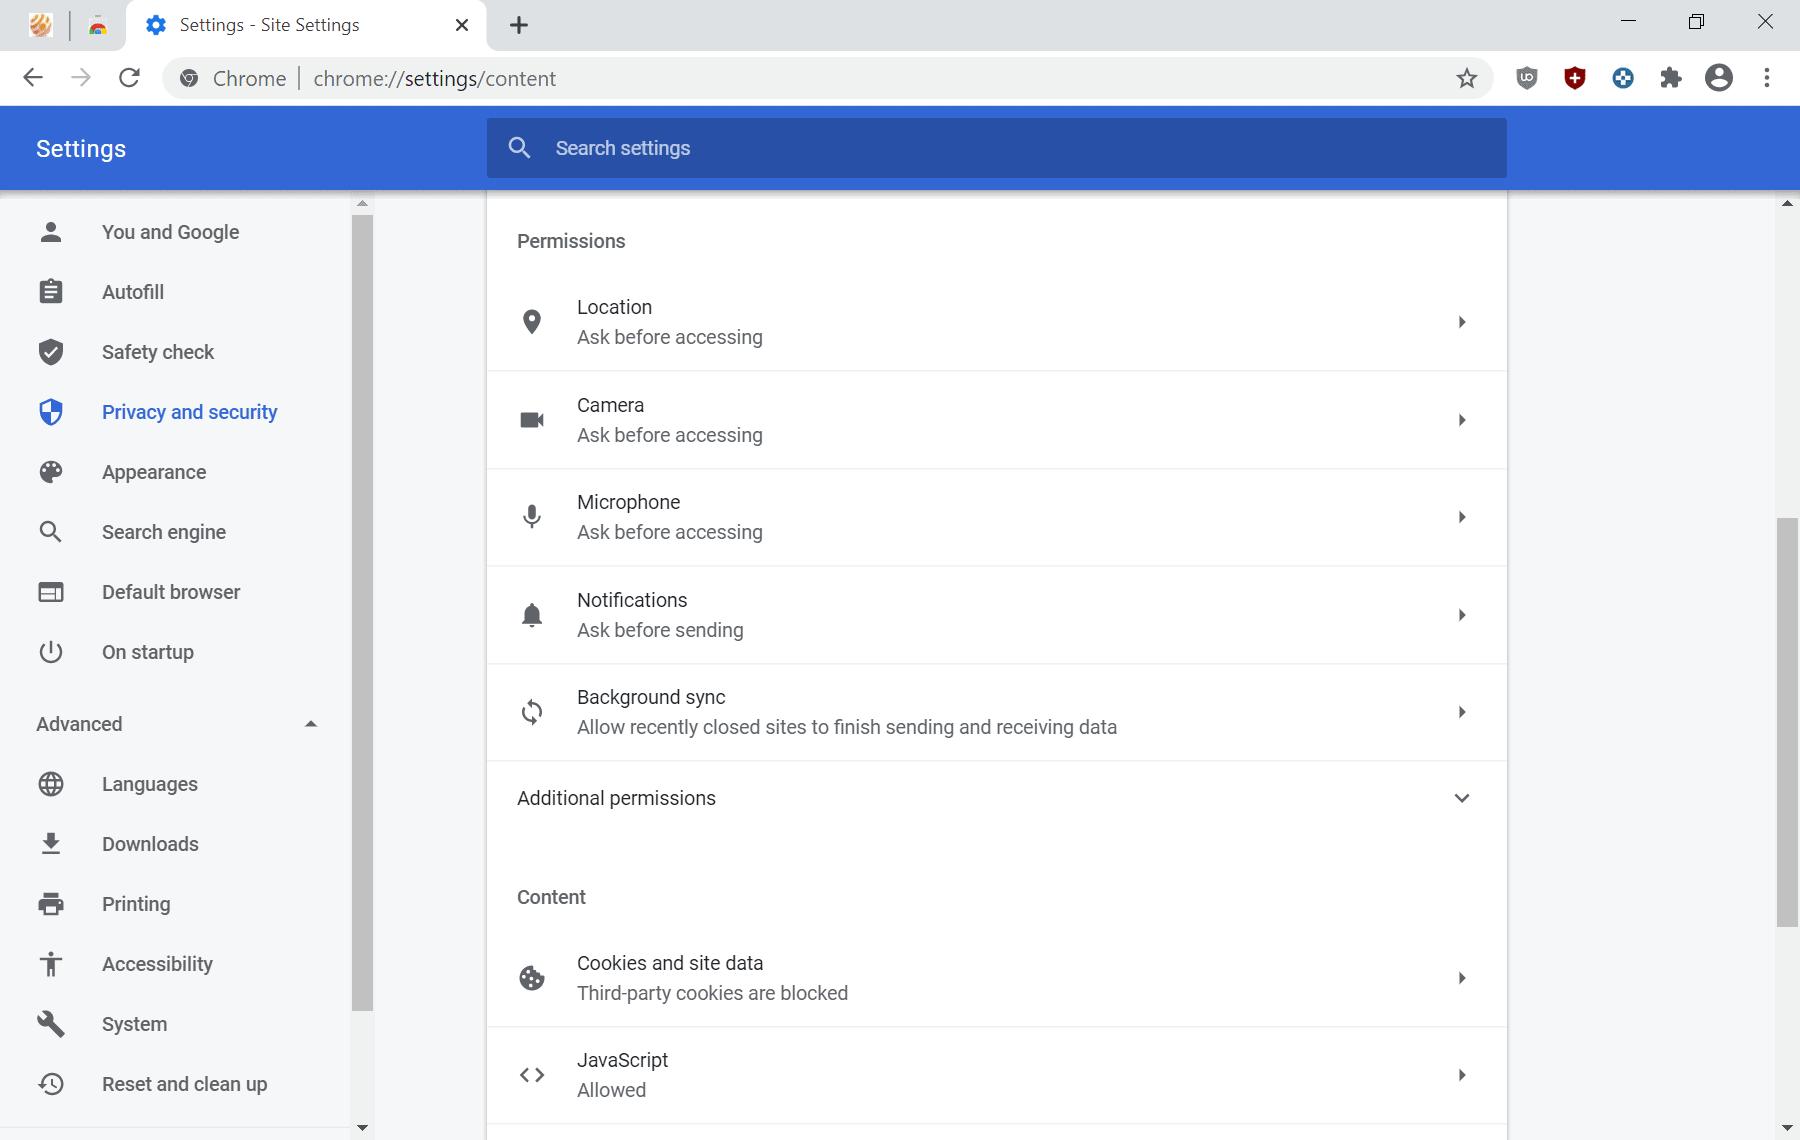 cchrome 83 site settings